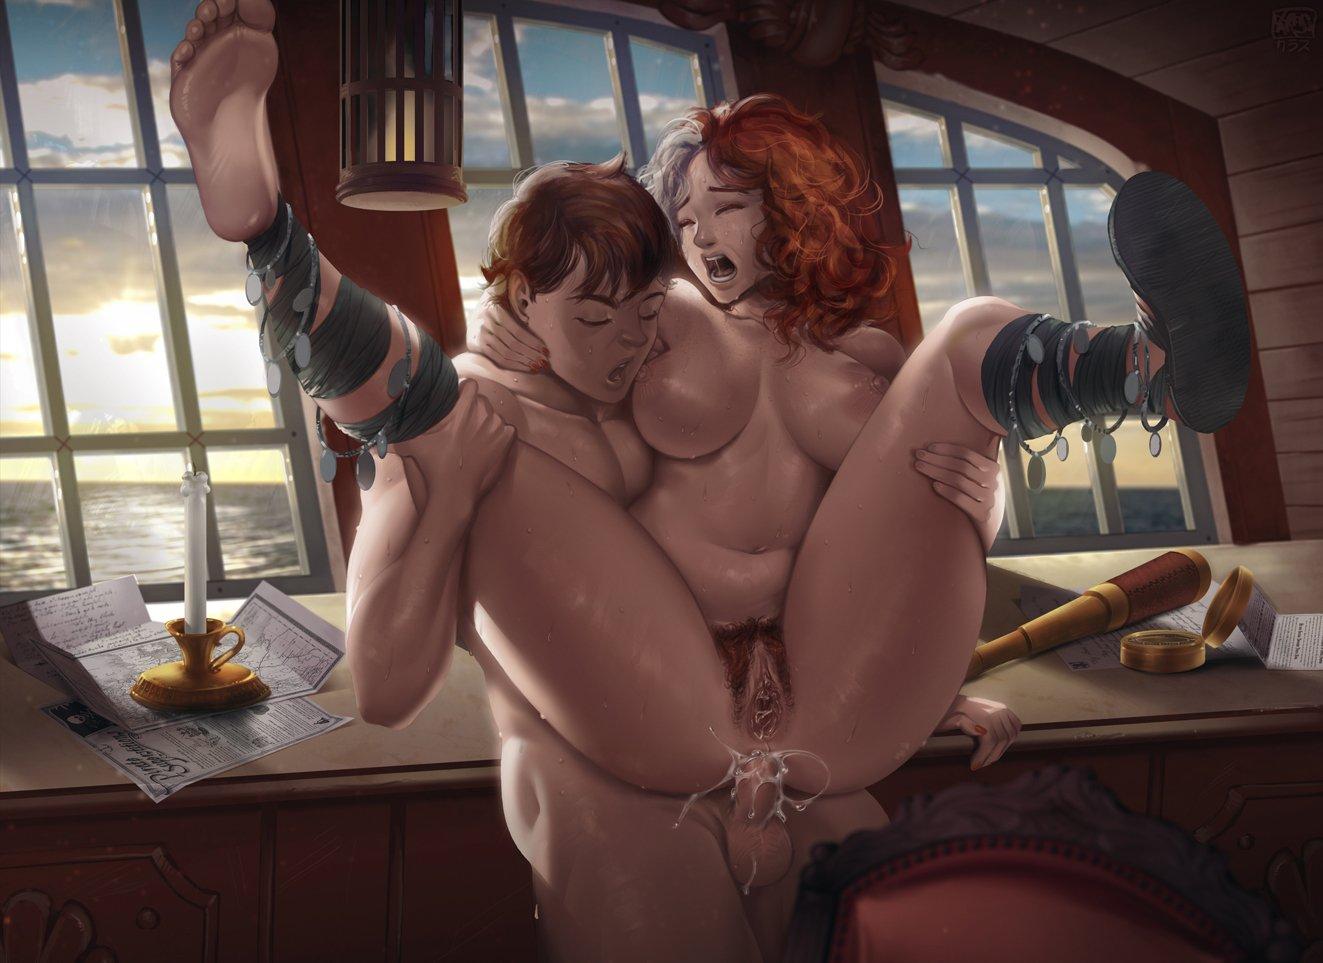 divinity mod nude original sin Sword art online suguha nude